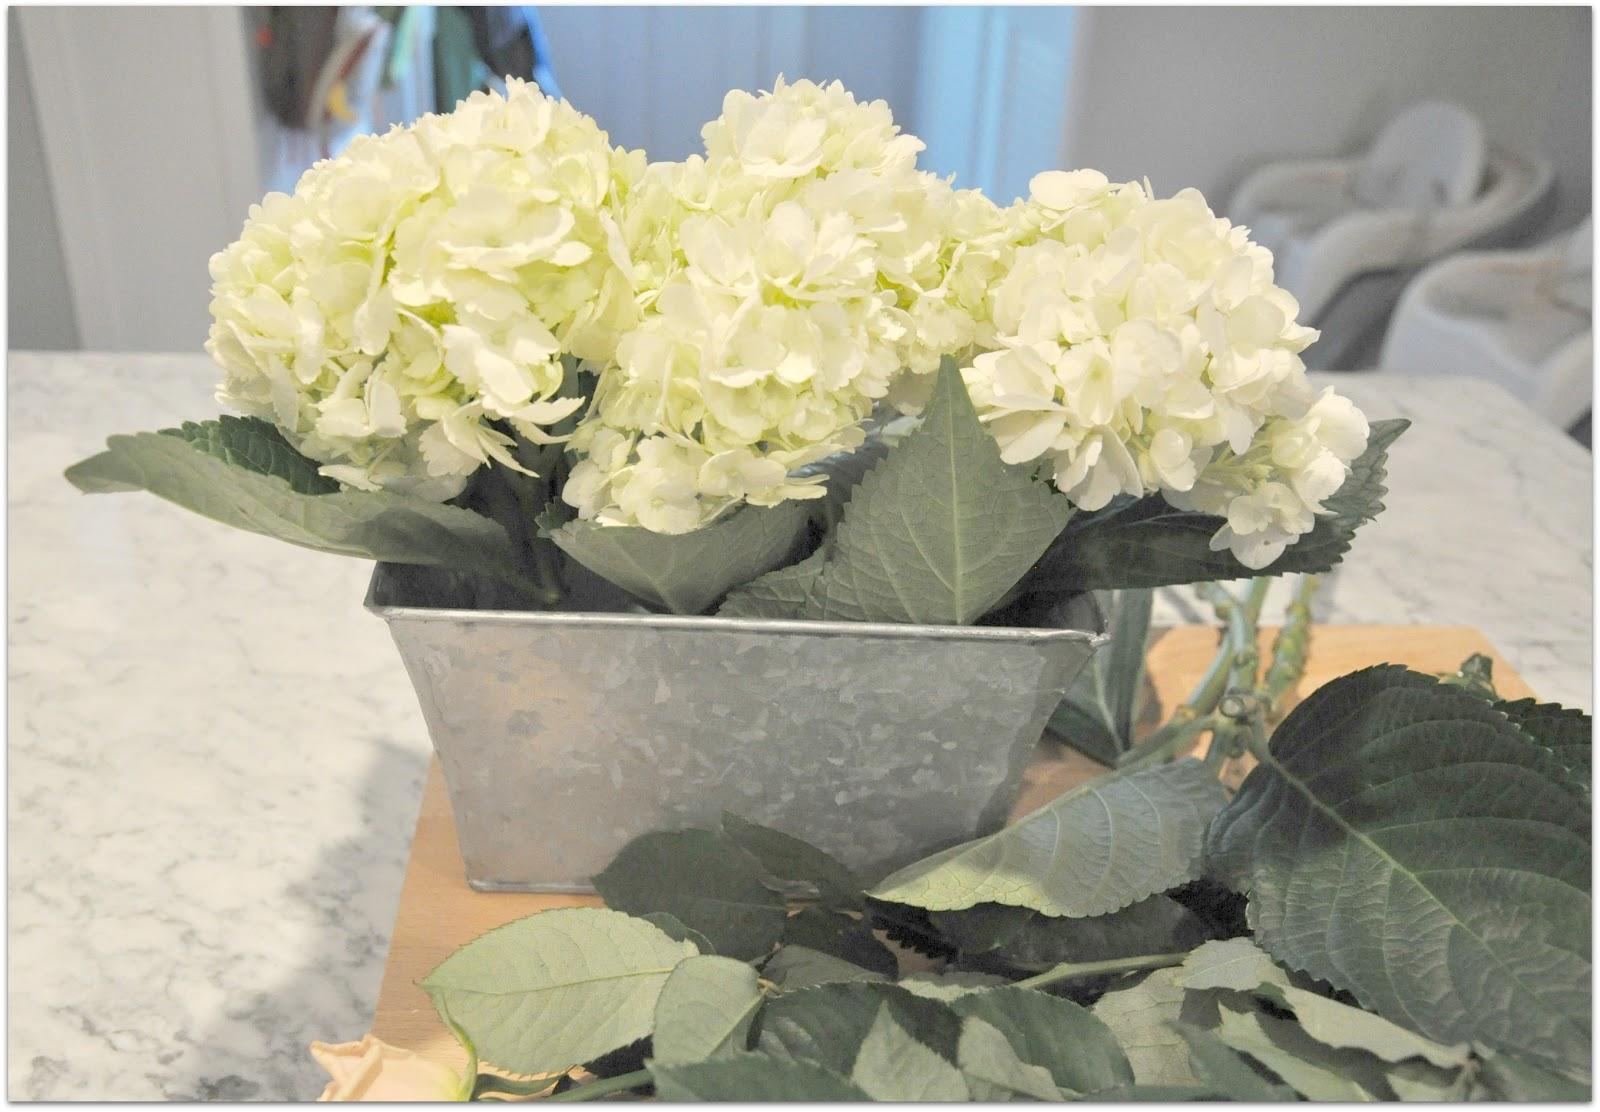 Hydrangea Centerpieces Diy : Hydrangea and rose diy centerpiece a lo behold life